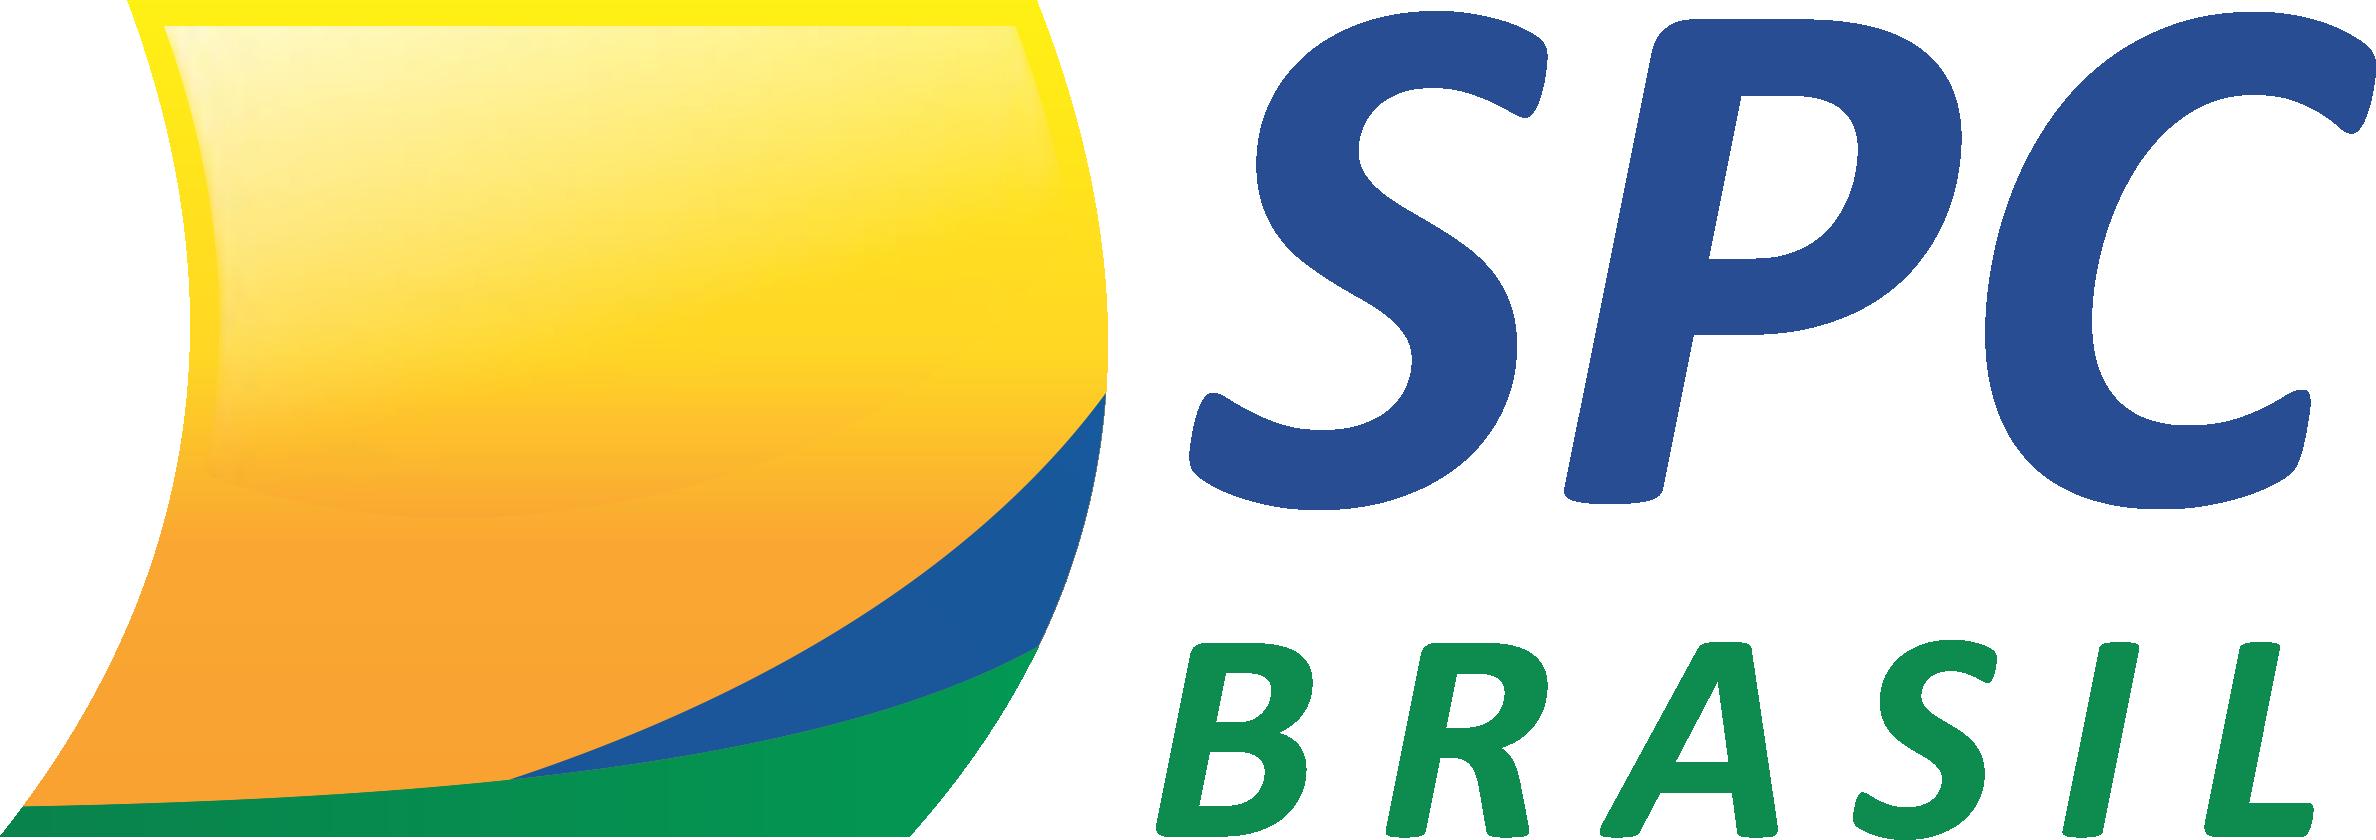 Cdl bh logo